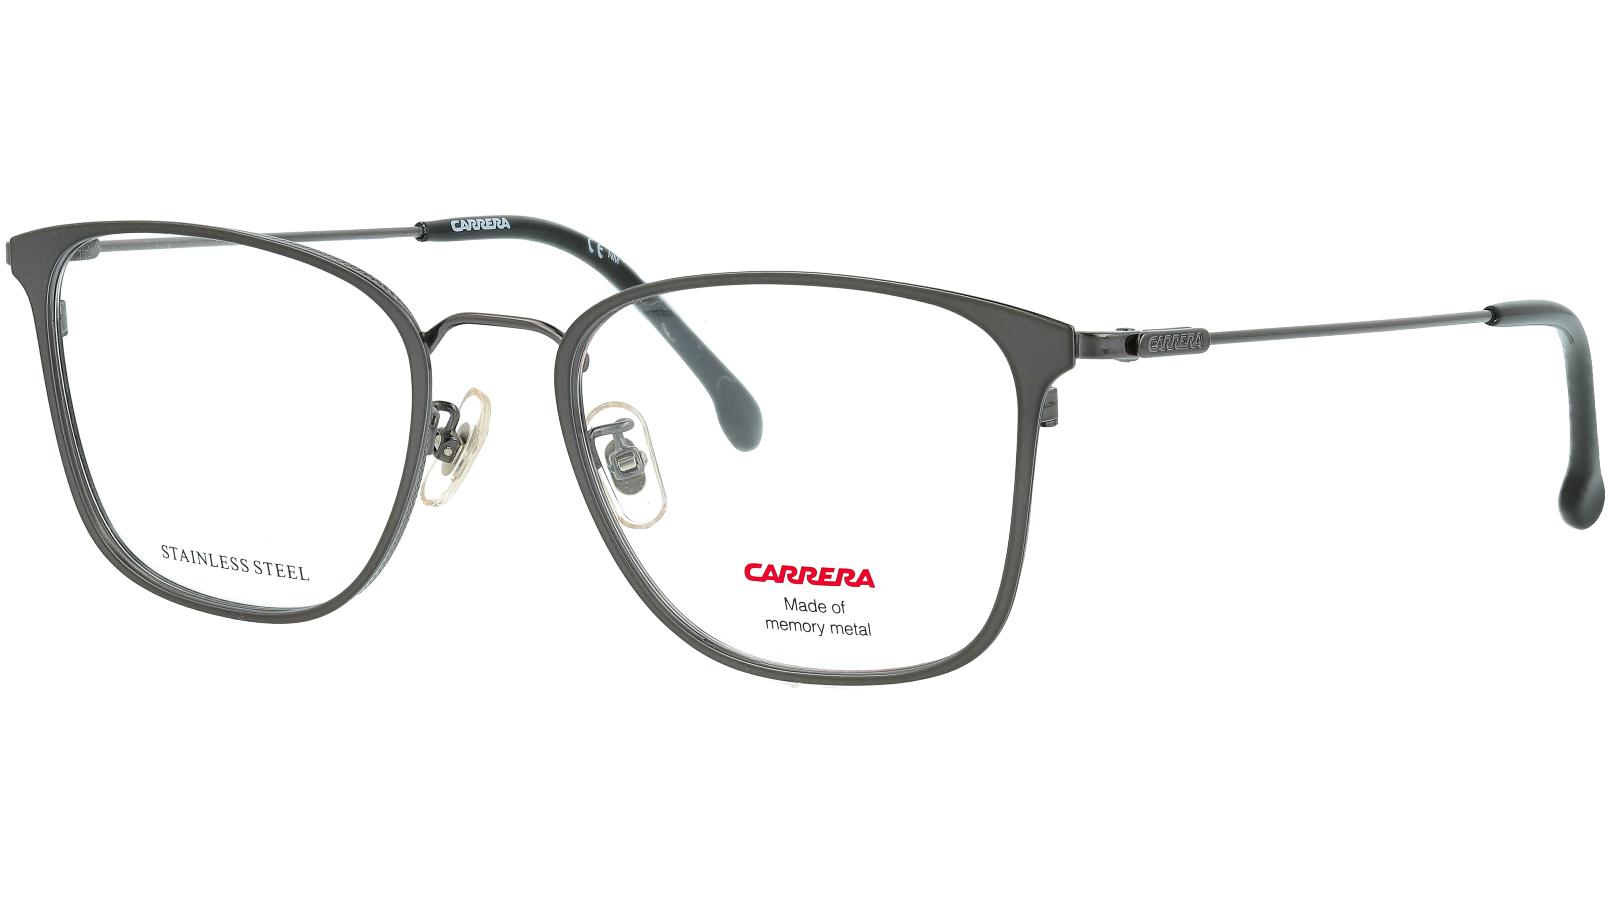 CARRERA CARRERA 192/G V81 52 DARK Glasses